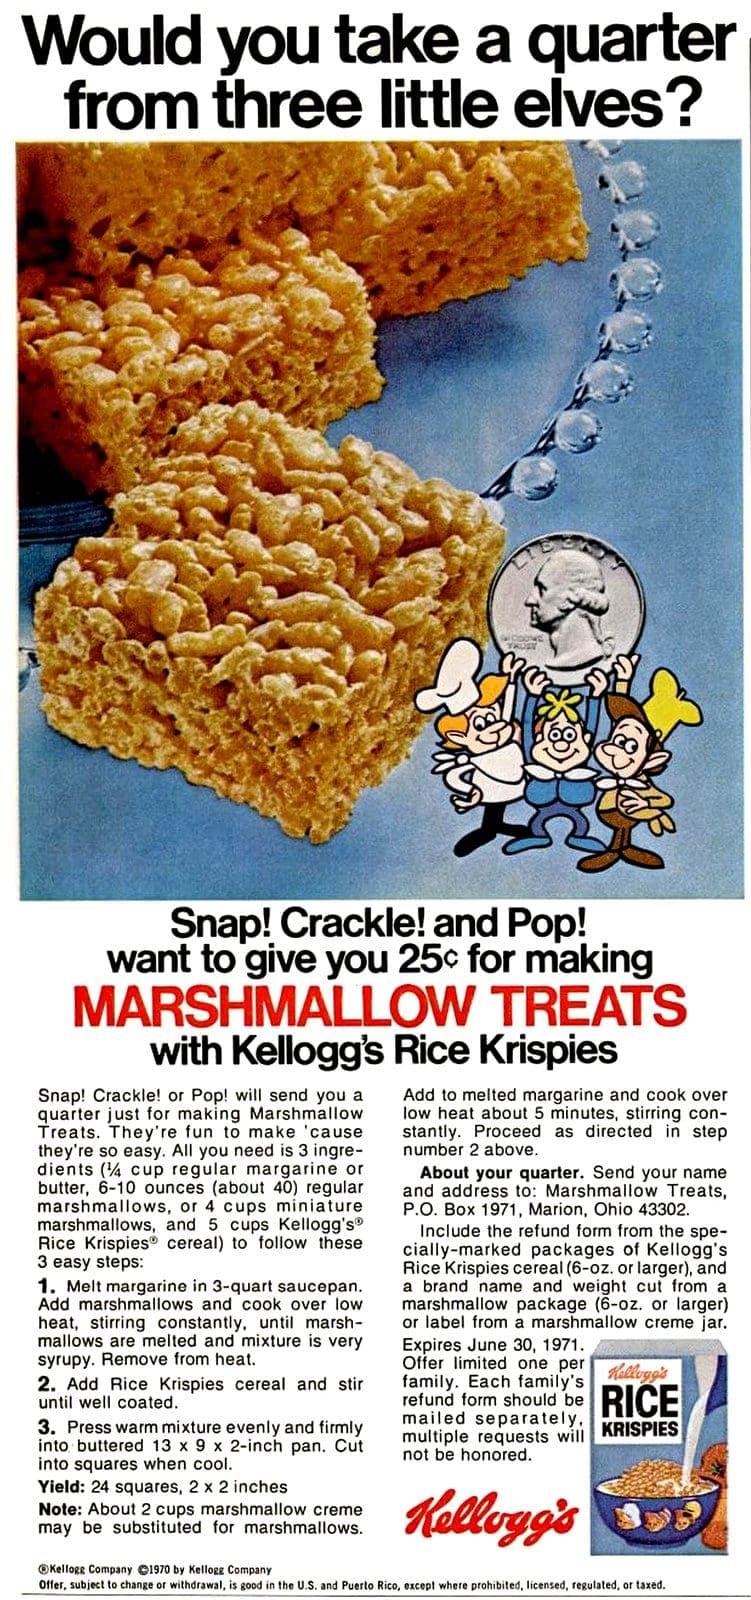 Original Rice Krispies treats recipe (1970)